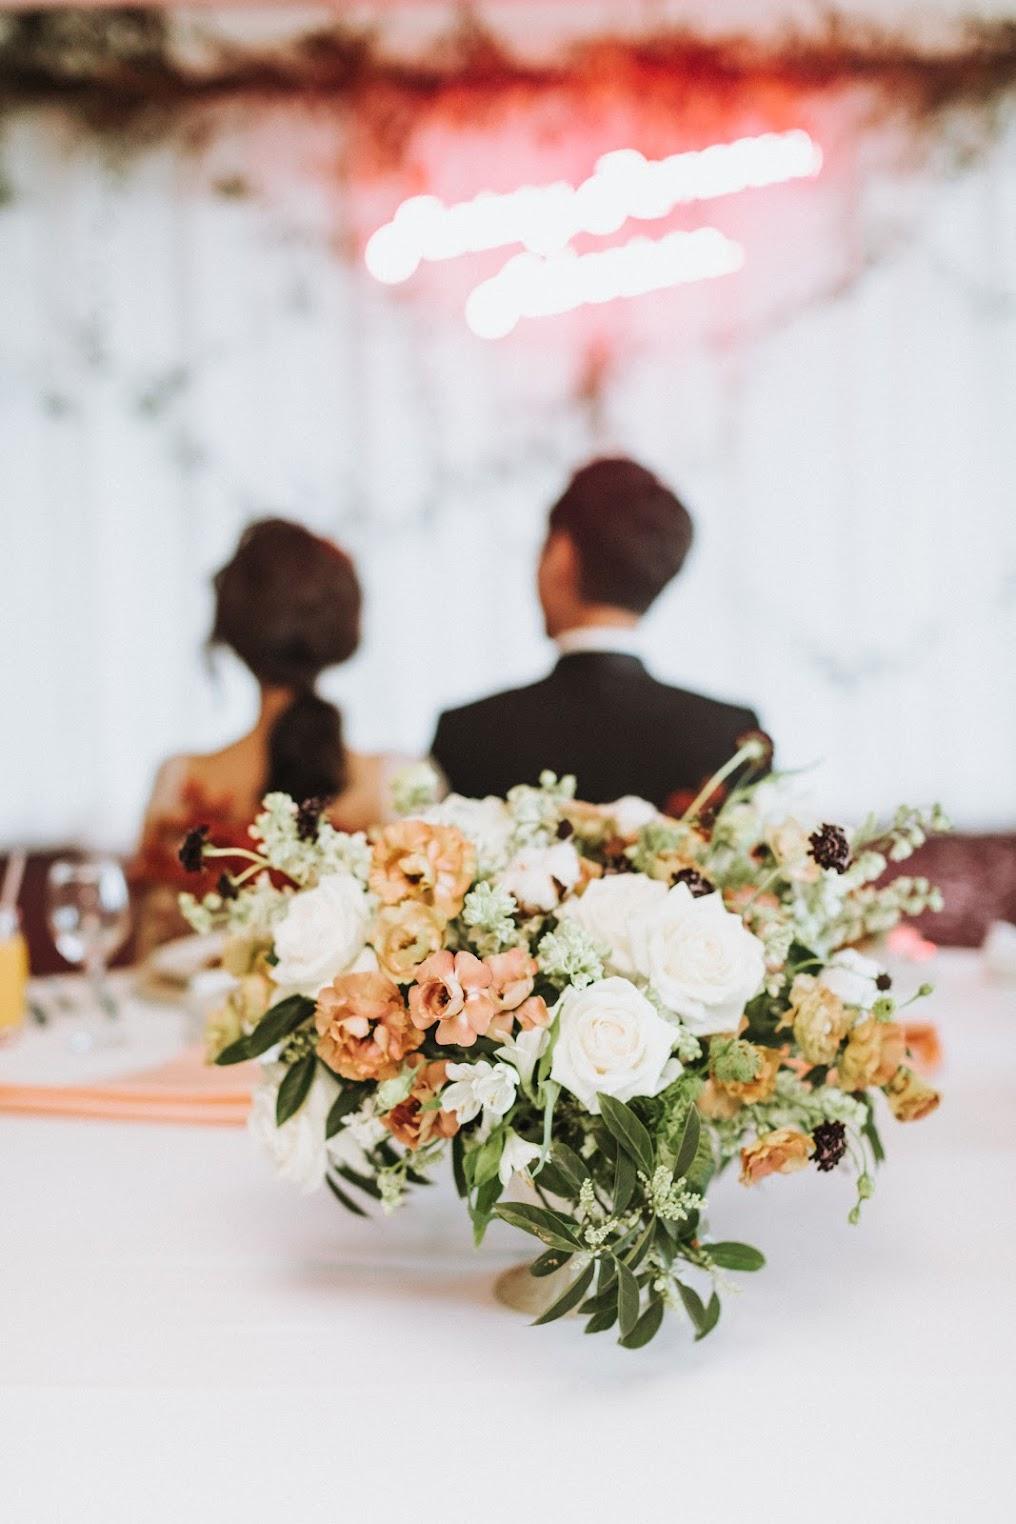 undefined日月潭涵碧樓婚禮,美式婚禮紀錄,AG婚攝,Amazing Grace 攝影美學,戶外婚禮